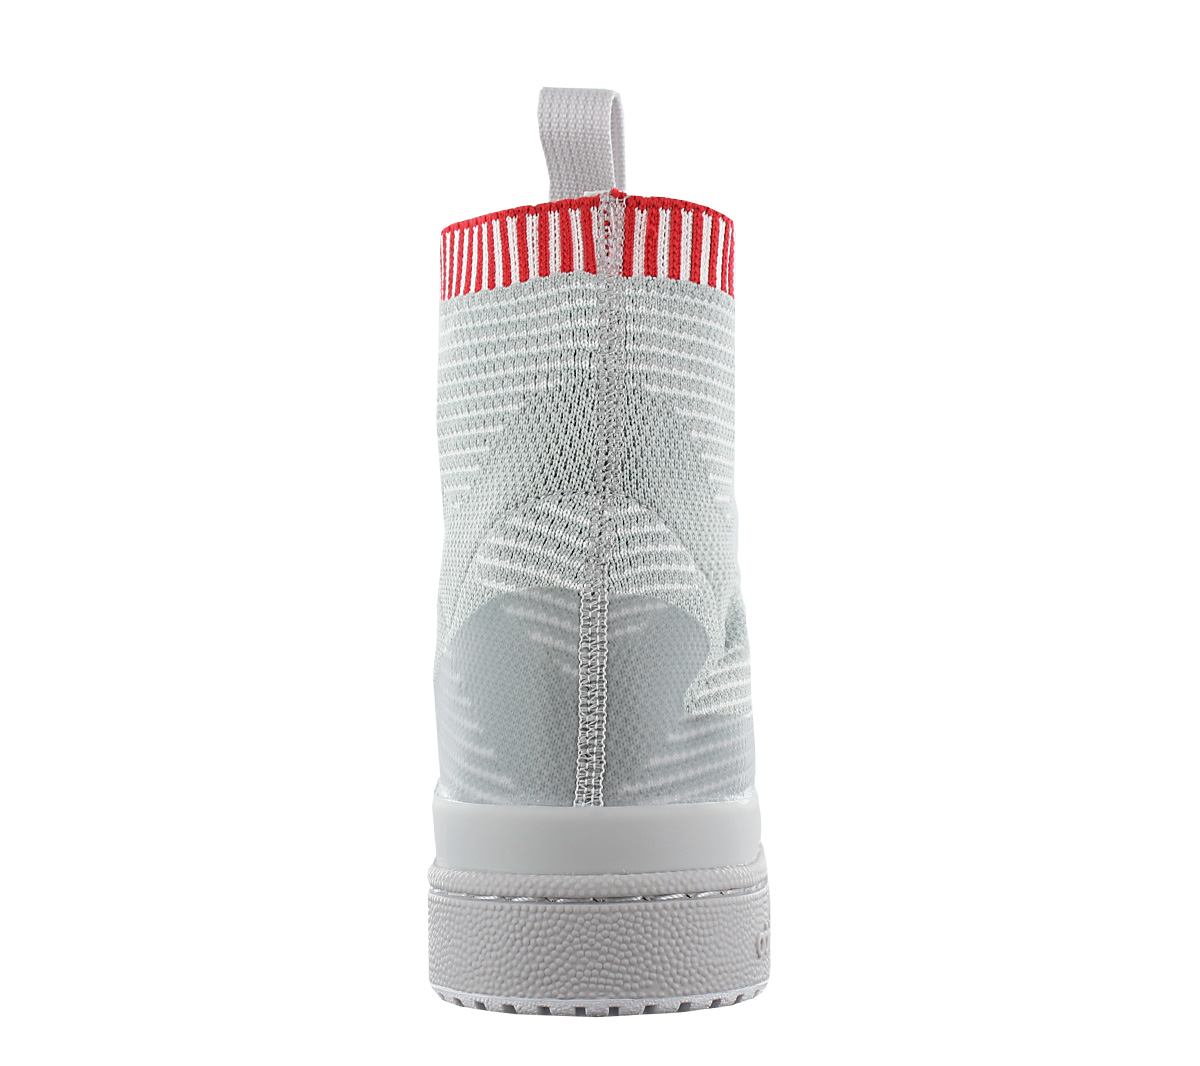 the best attitude d7194 18615 Adidas Originals Forum Winter Pk Primeknit Shoes Trainers Bo